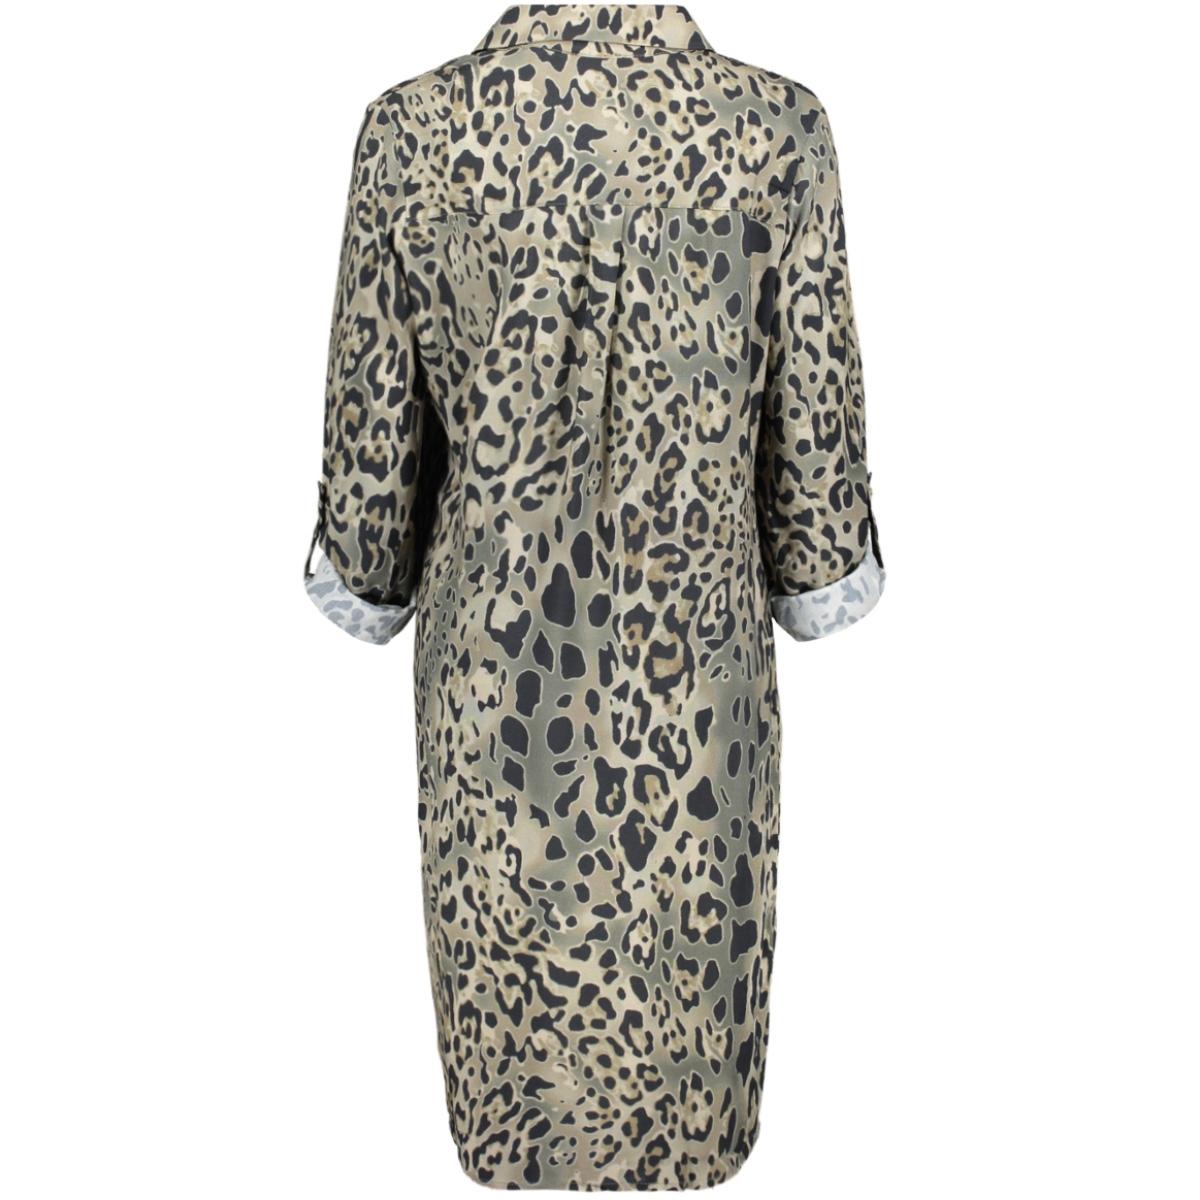 dress aop leopard 07039 60 geisha jurk army camouflage